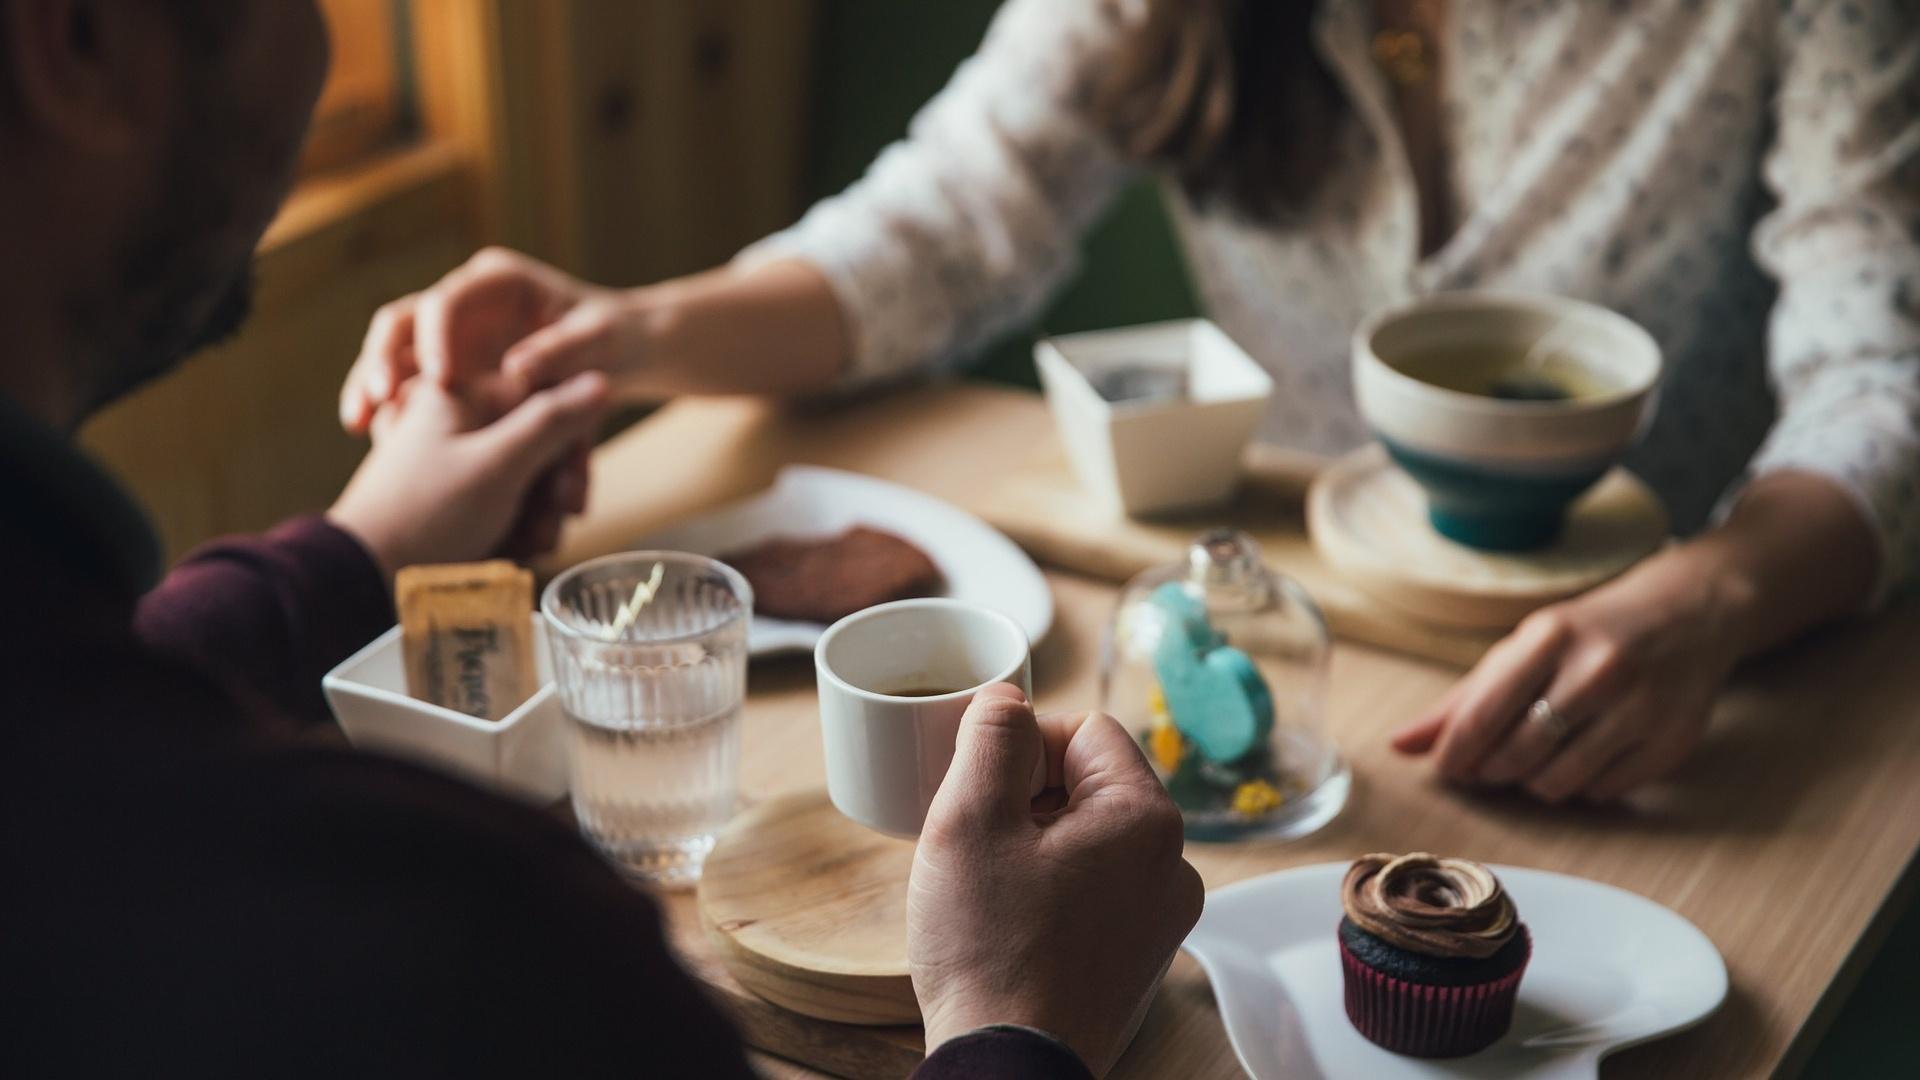 Achtsam essen: Das steckt dahinter